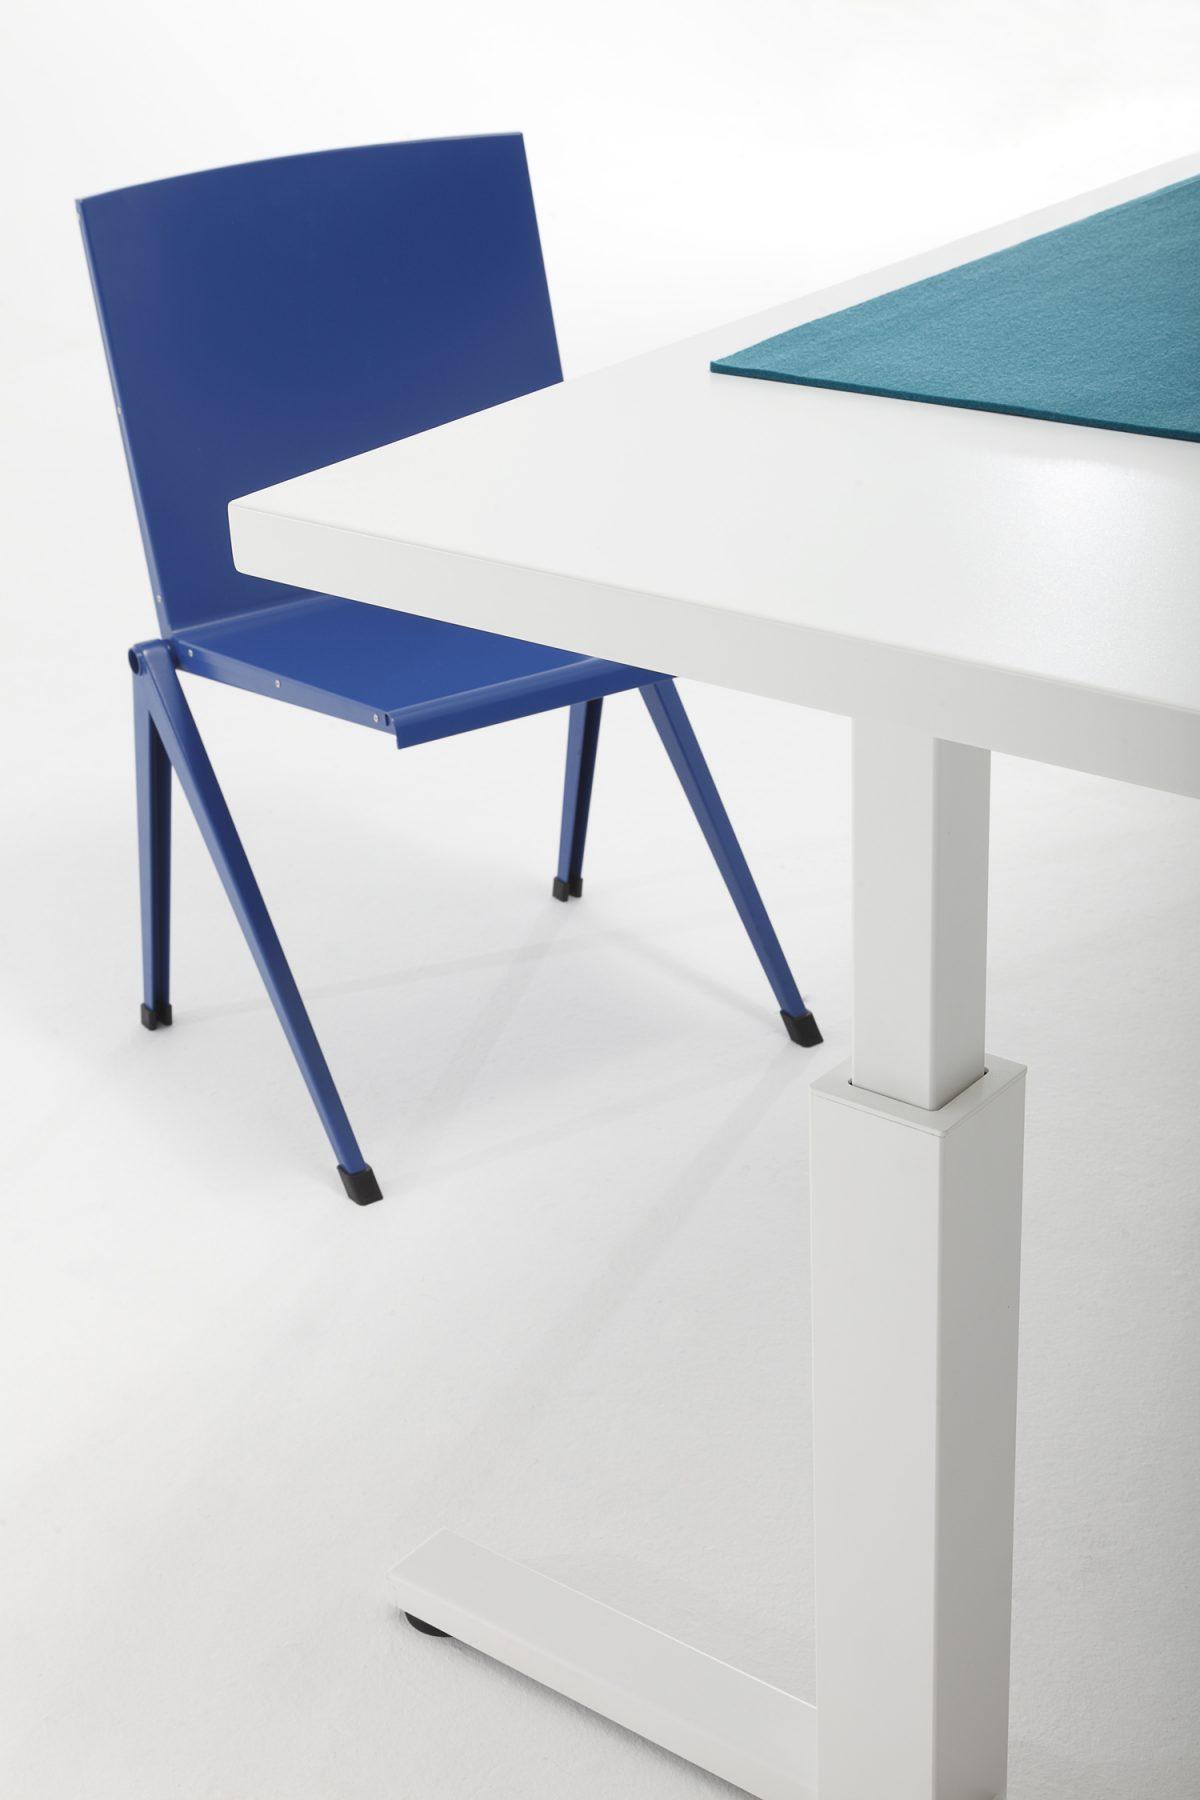 Gispen SteelTop bureau detail met Mondial chair van Rietveld